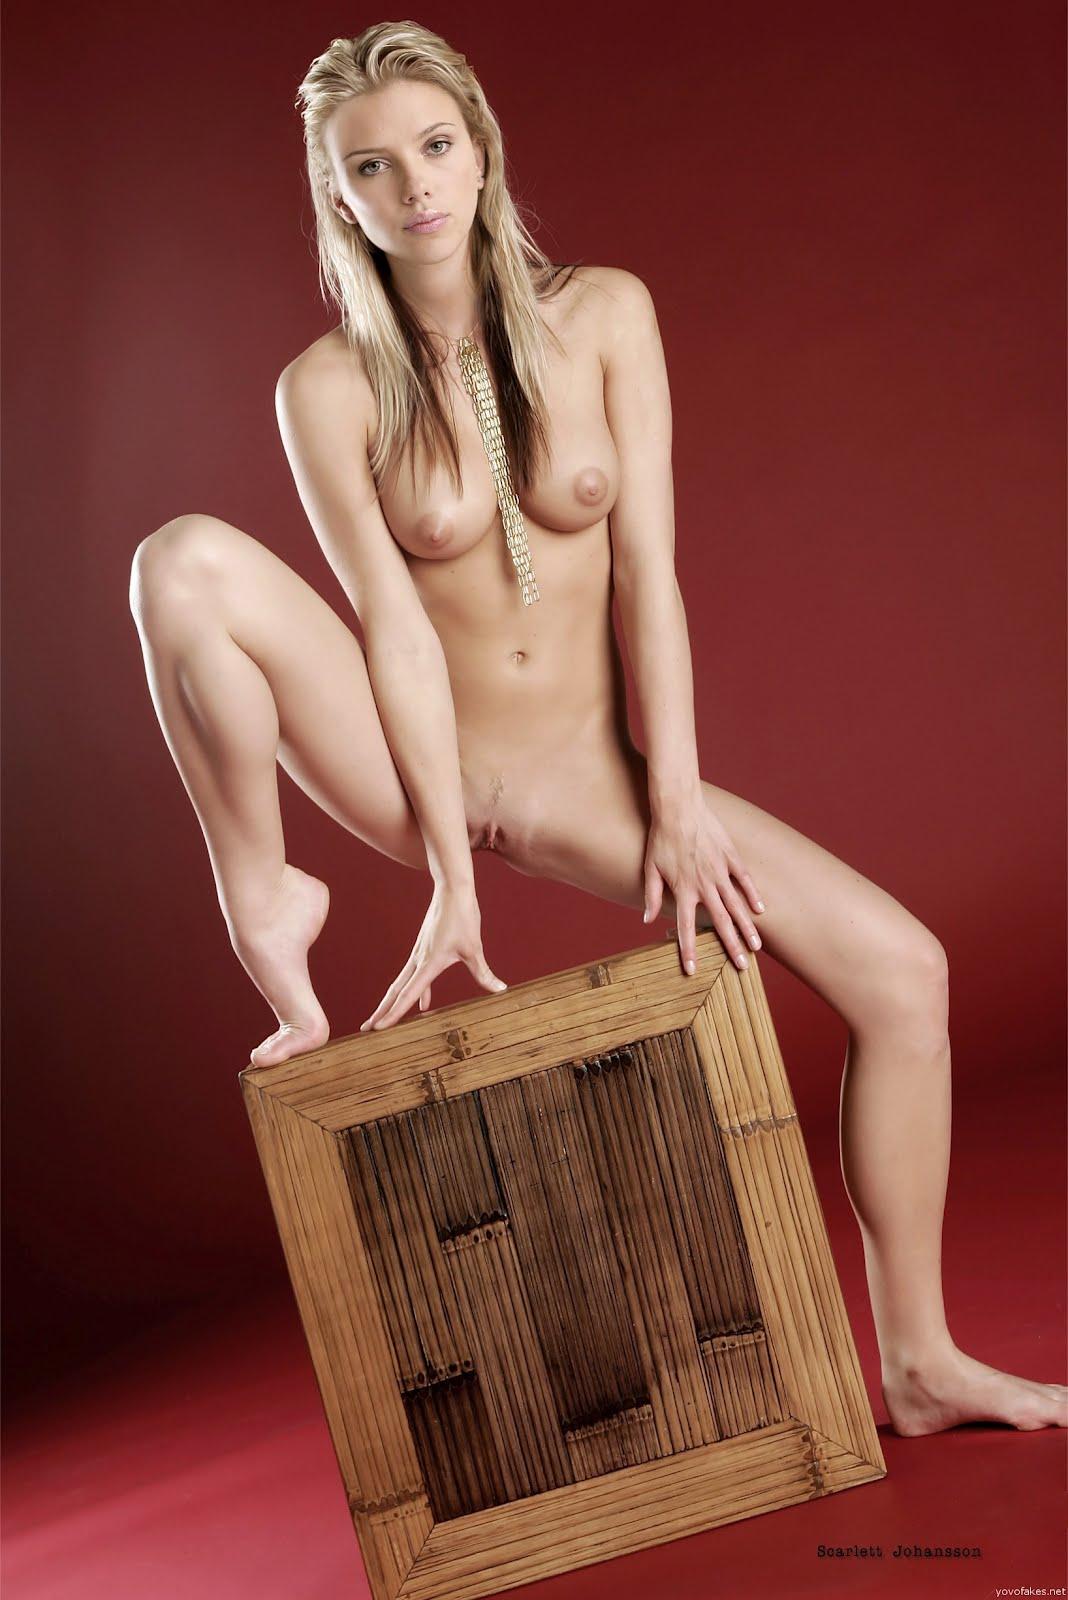 Nude Hot Gallery